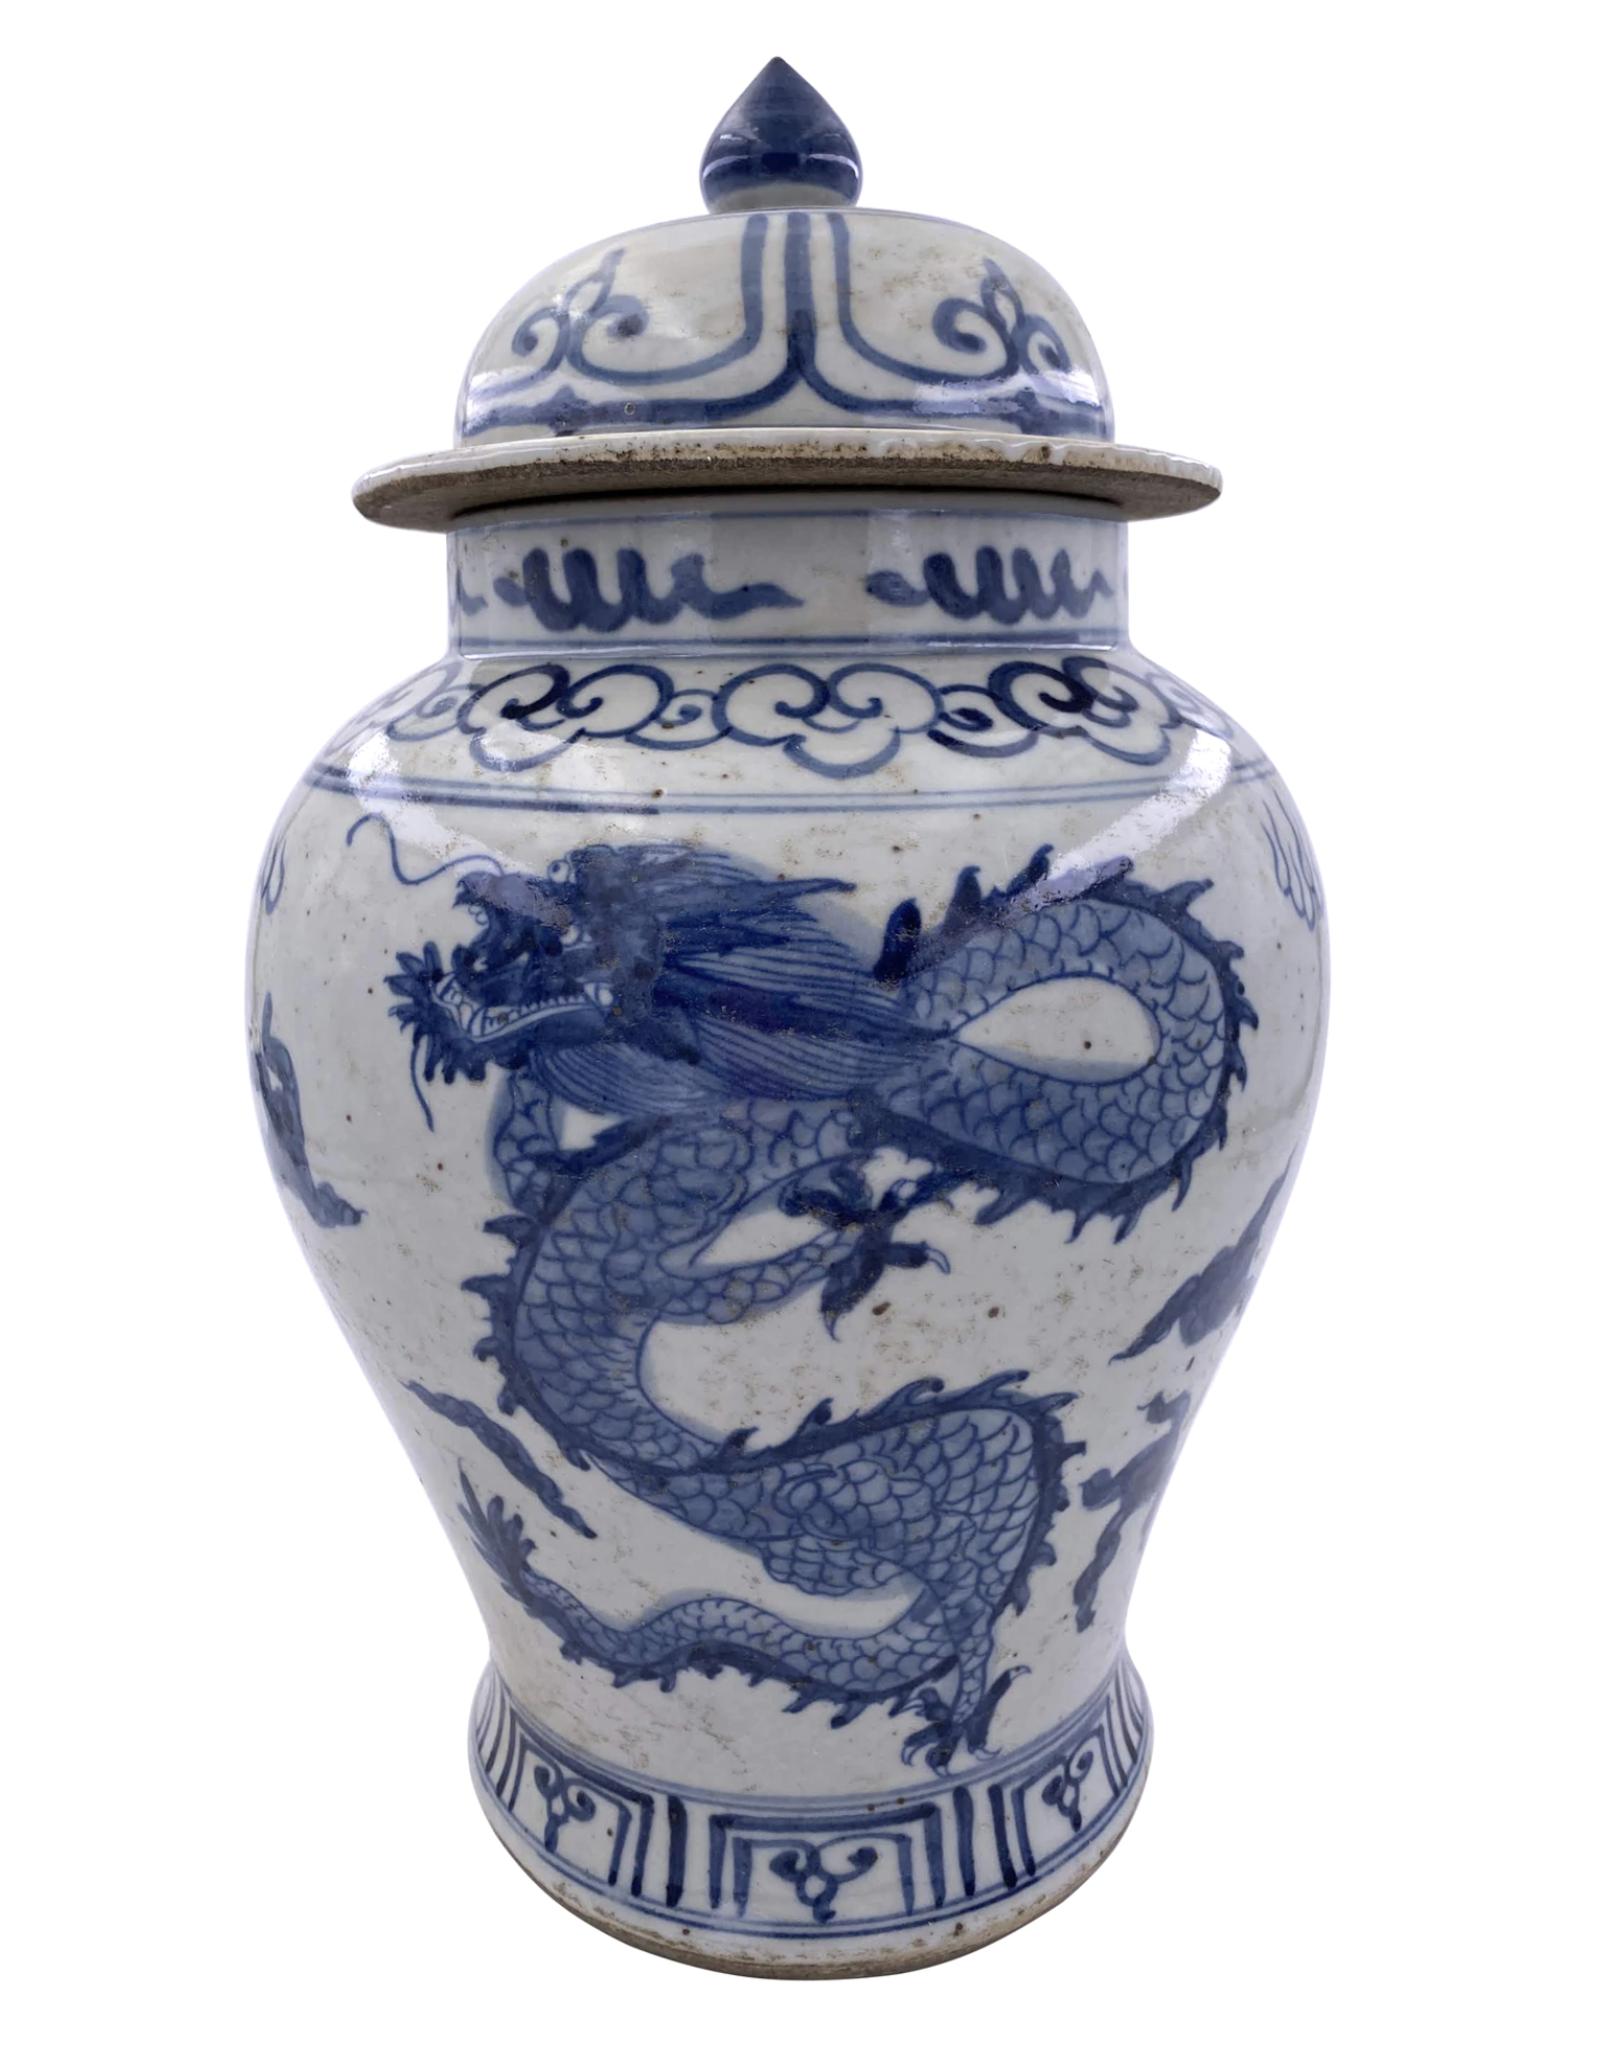 Blue & White Porcelain Temple Jar w/ Dragon - Small